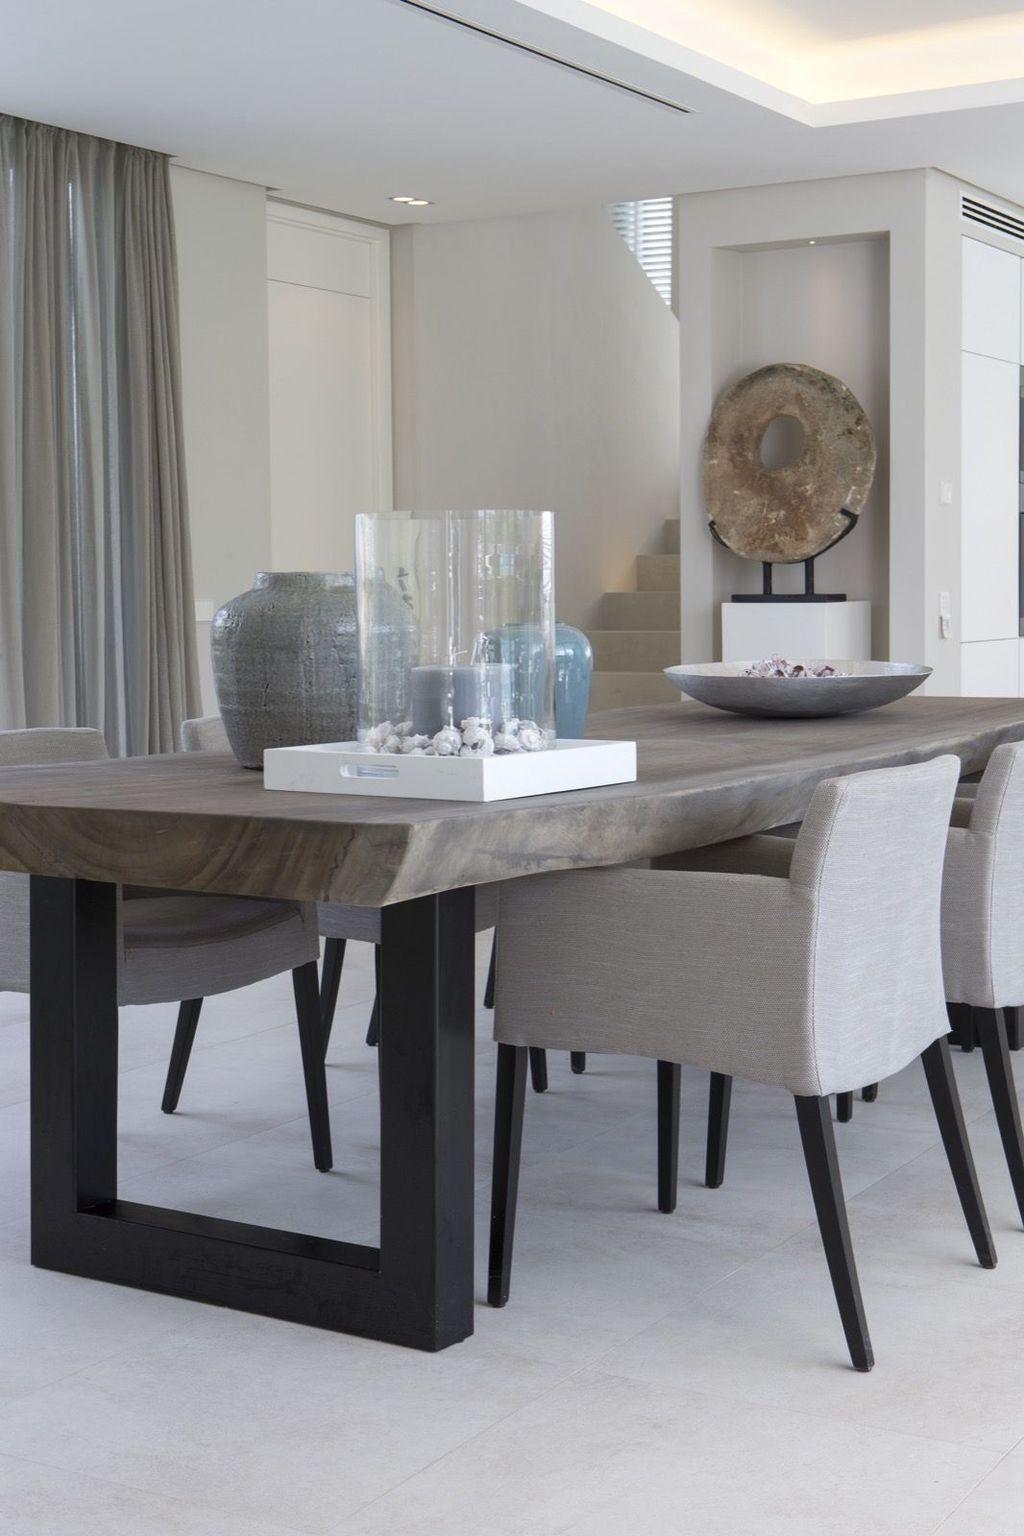 The Stylish Contemporary Dining Room Sets Giorgio Italian Modern